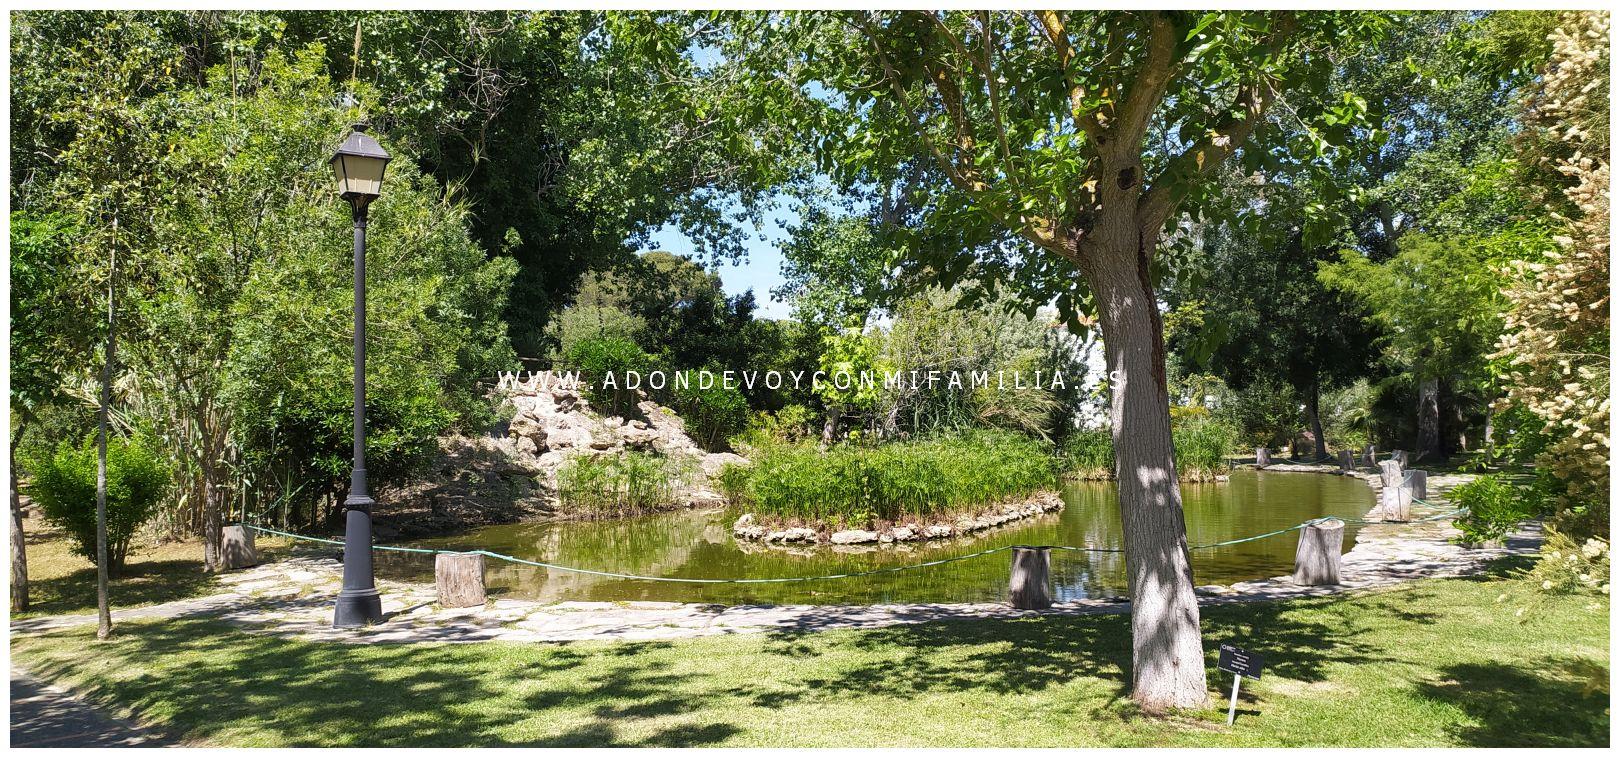 jardin botanico celestino muits rota adondevoyconmifamilia 03